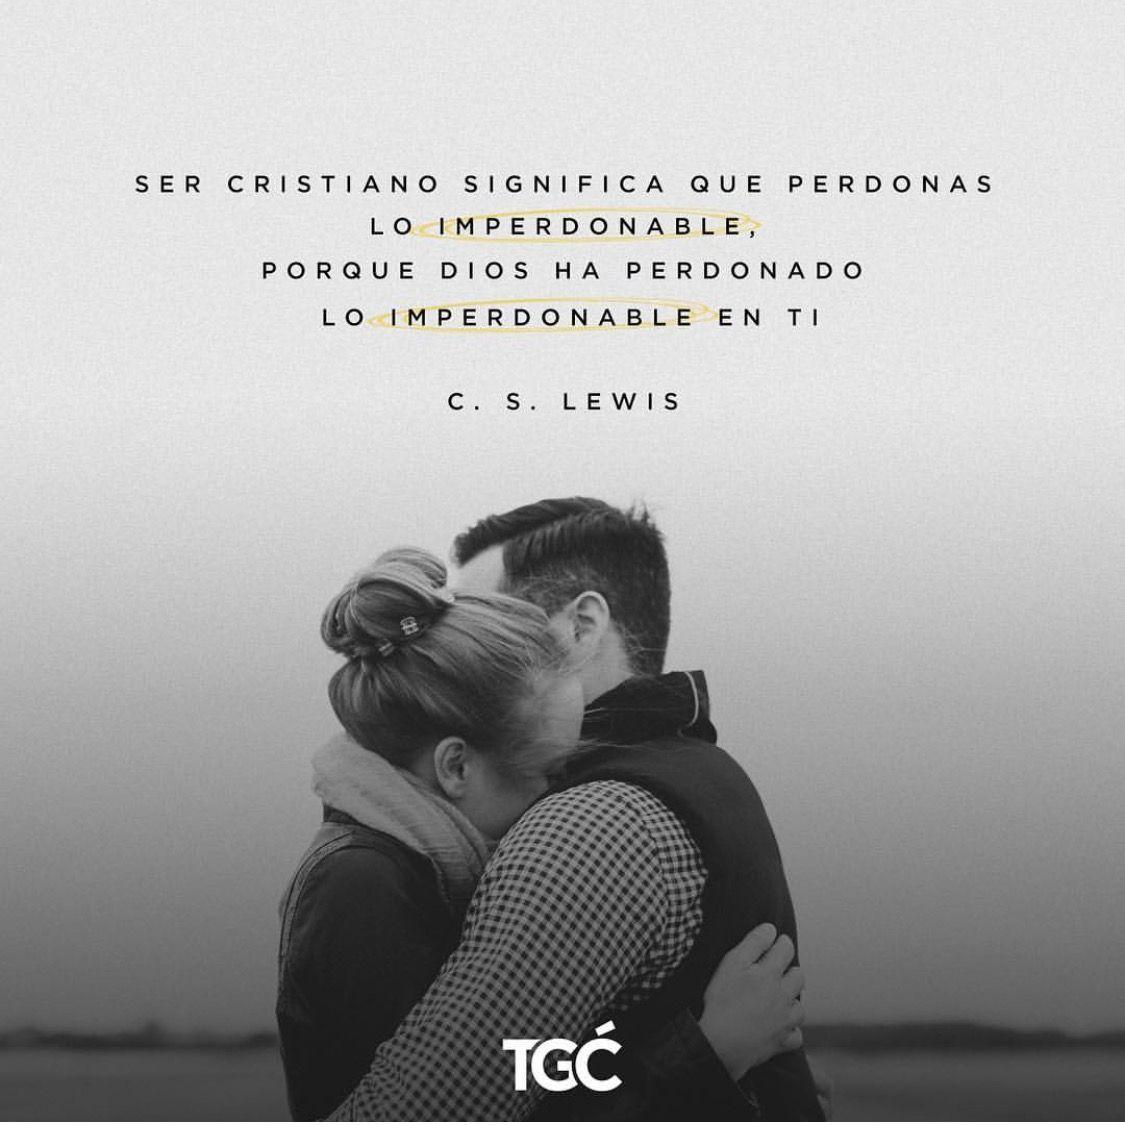 Fidelidad Matrimonio Biblia : Frases cristianos infidelidad matrimonio fidelidad